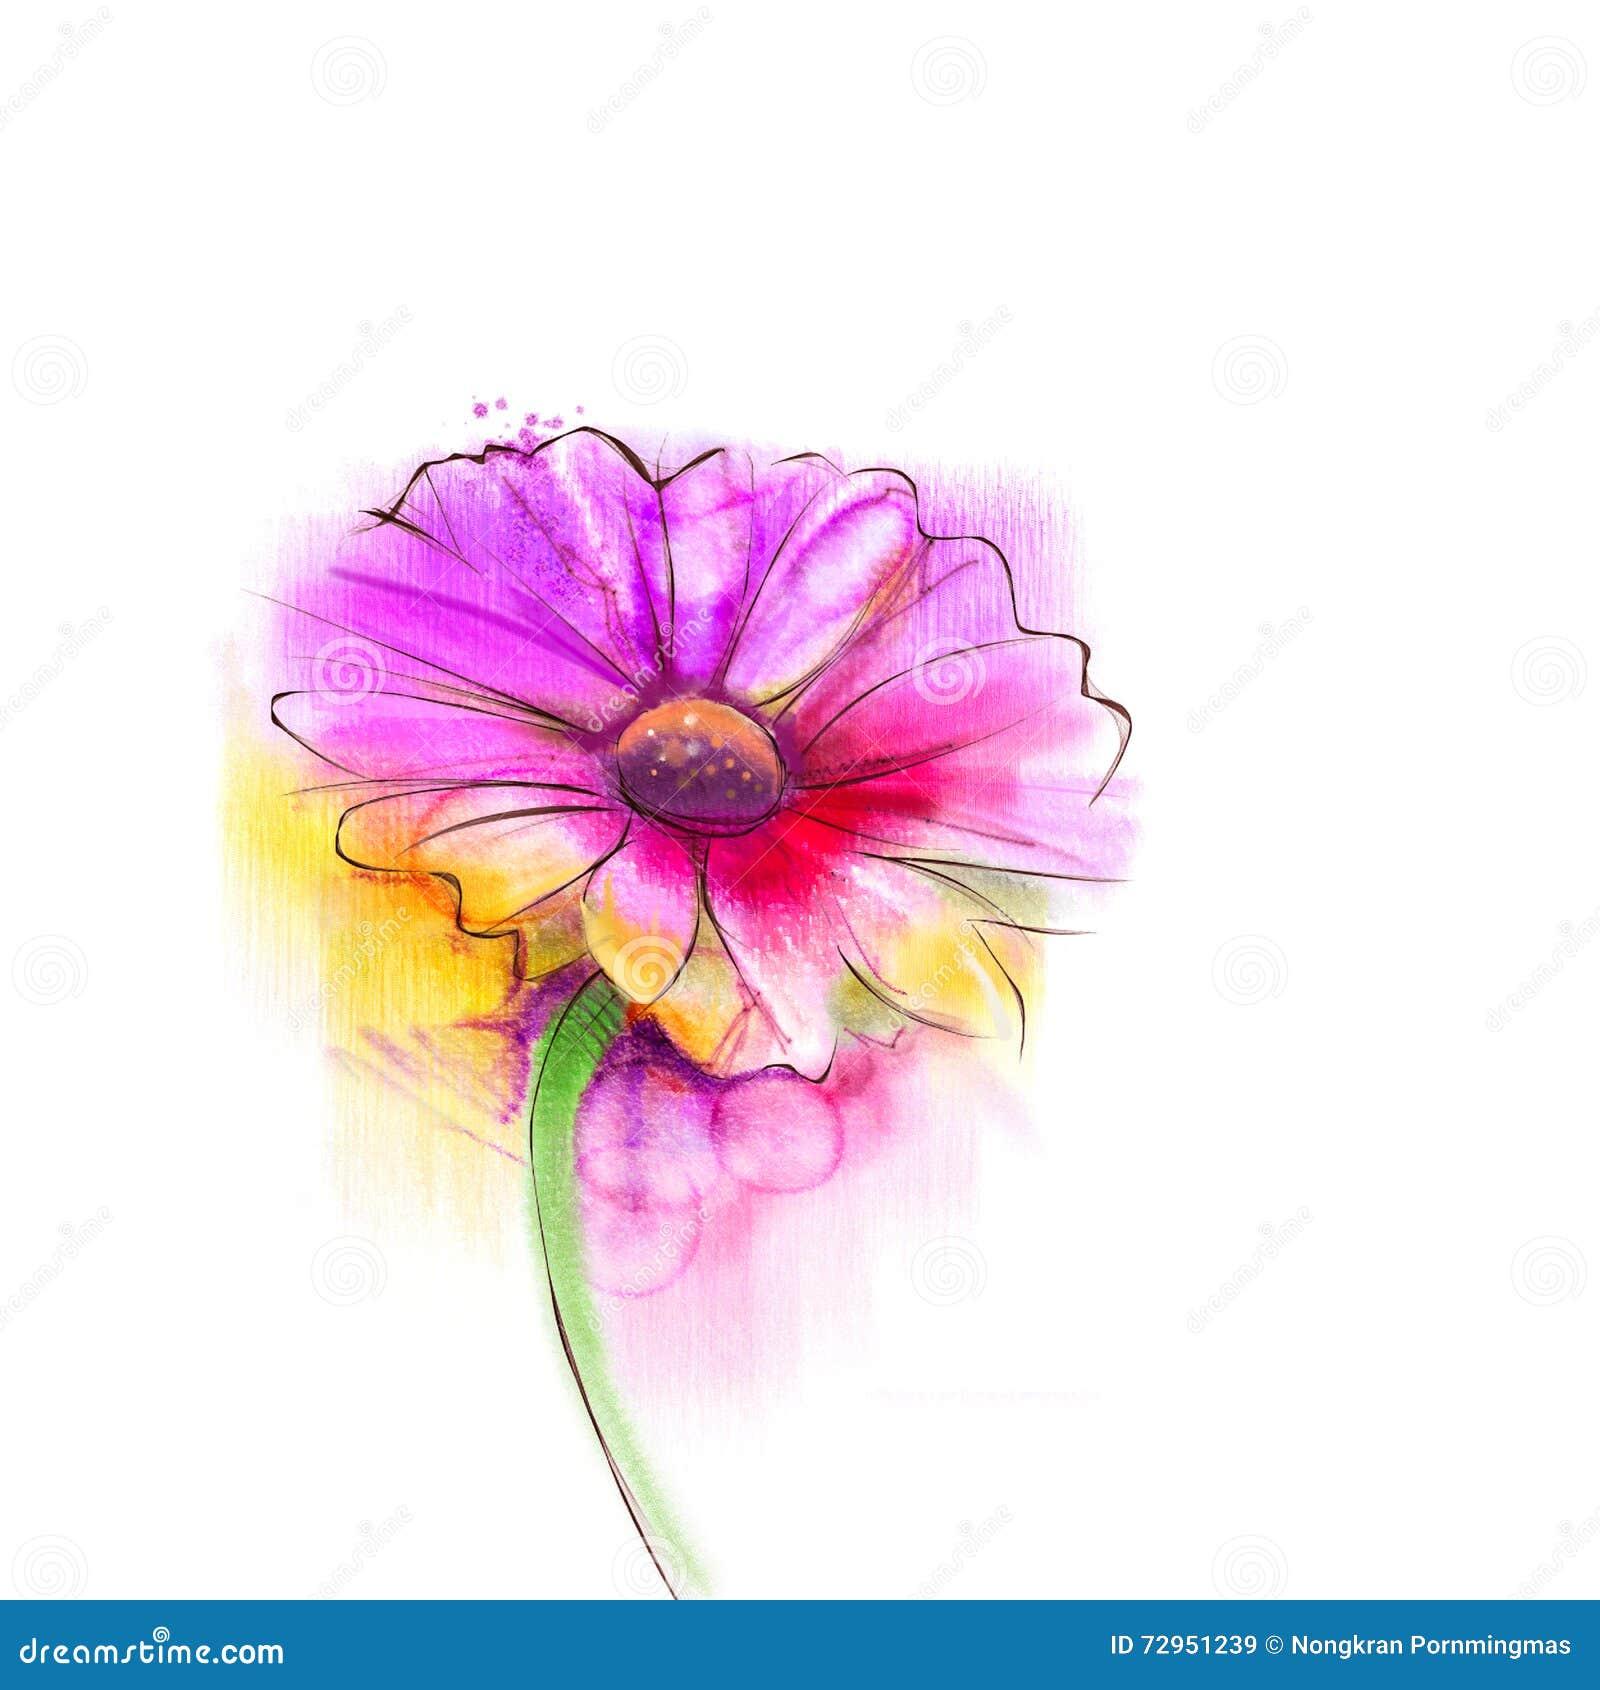 Essay on Flower